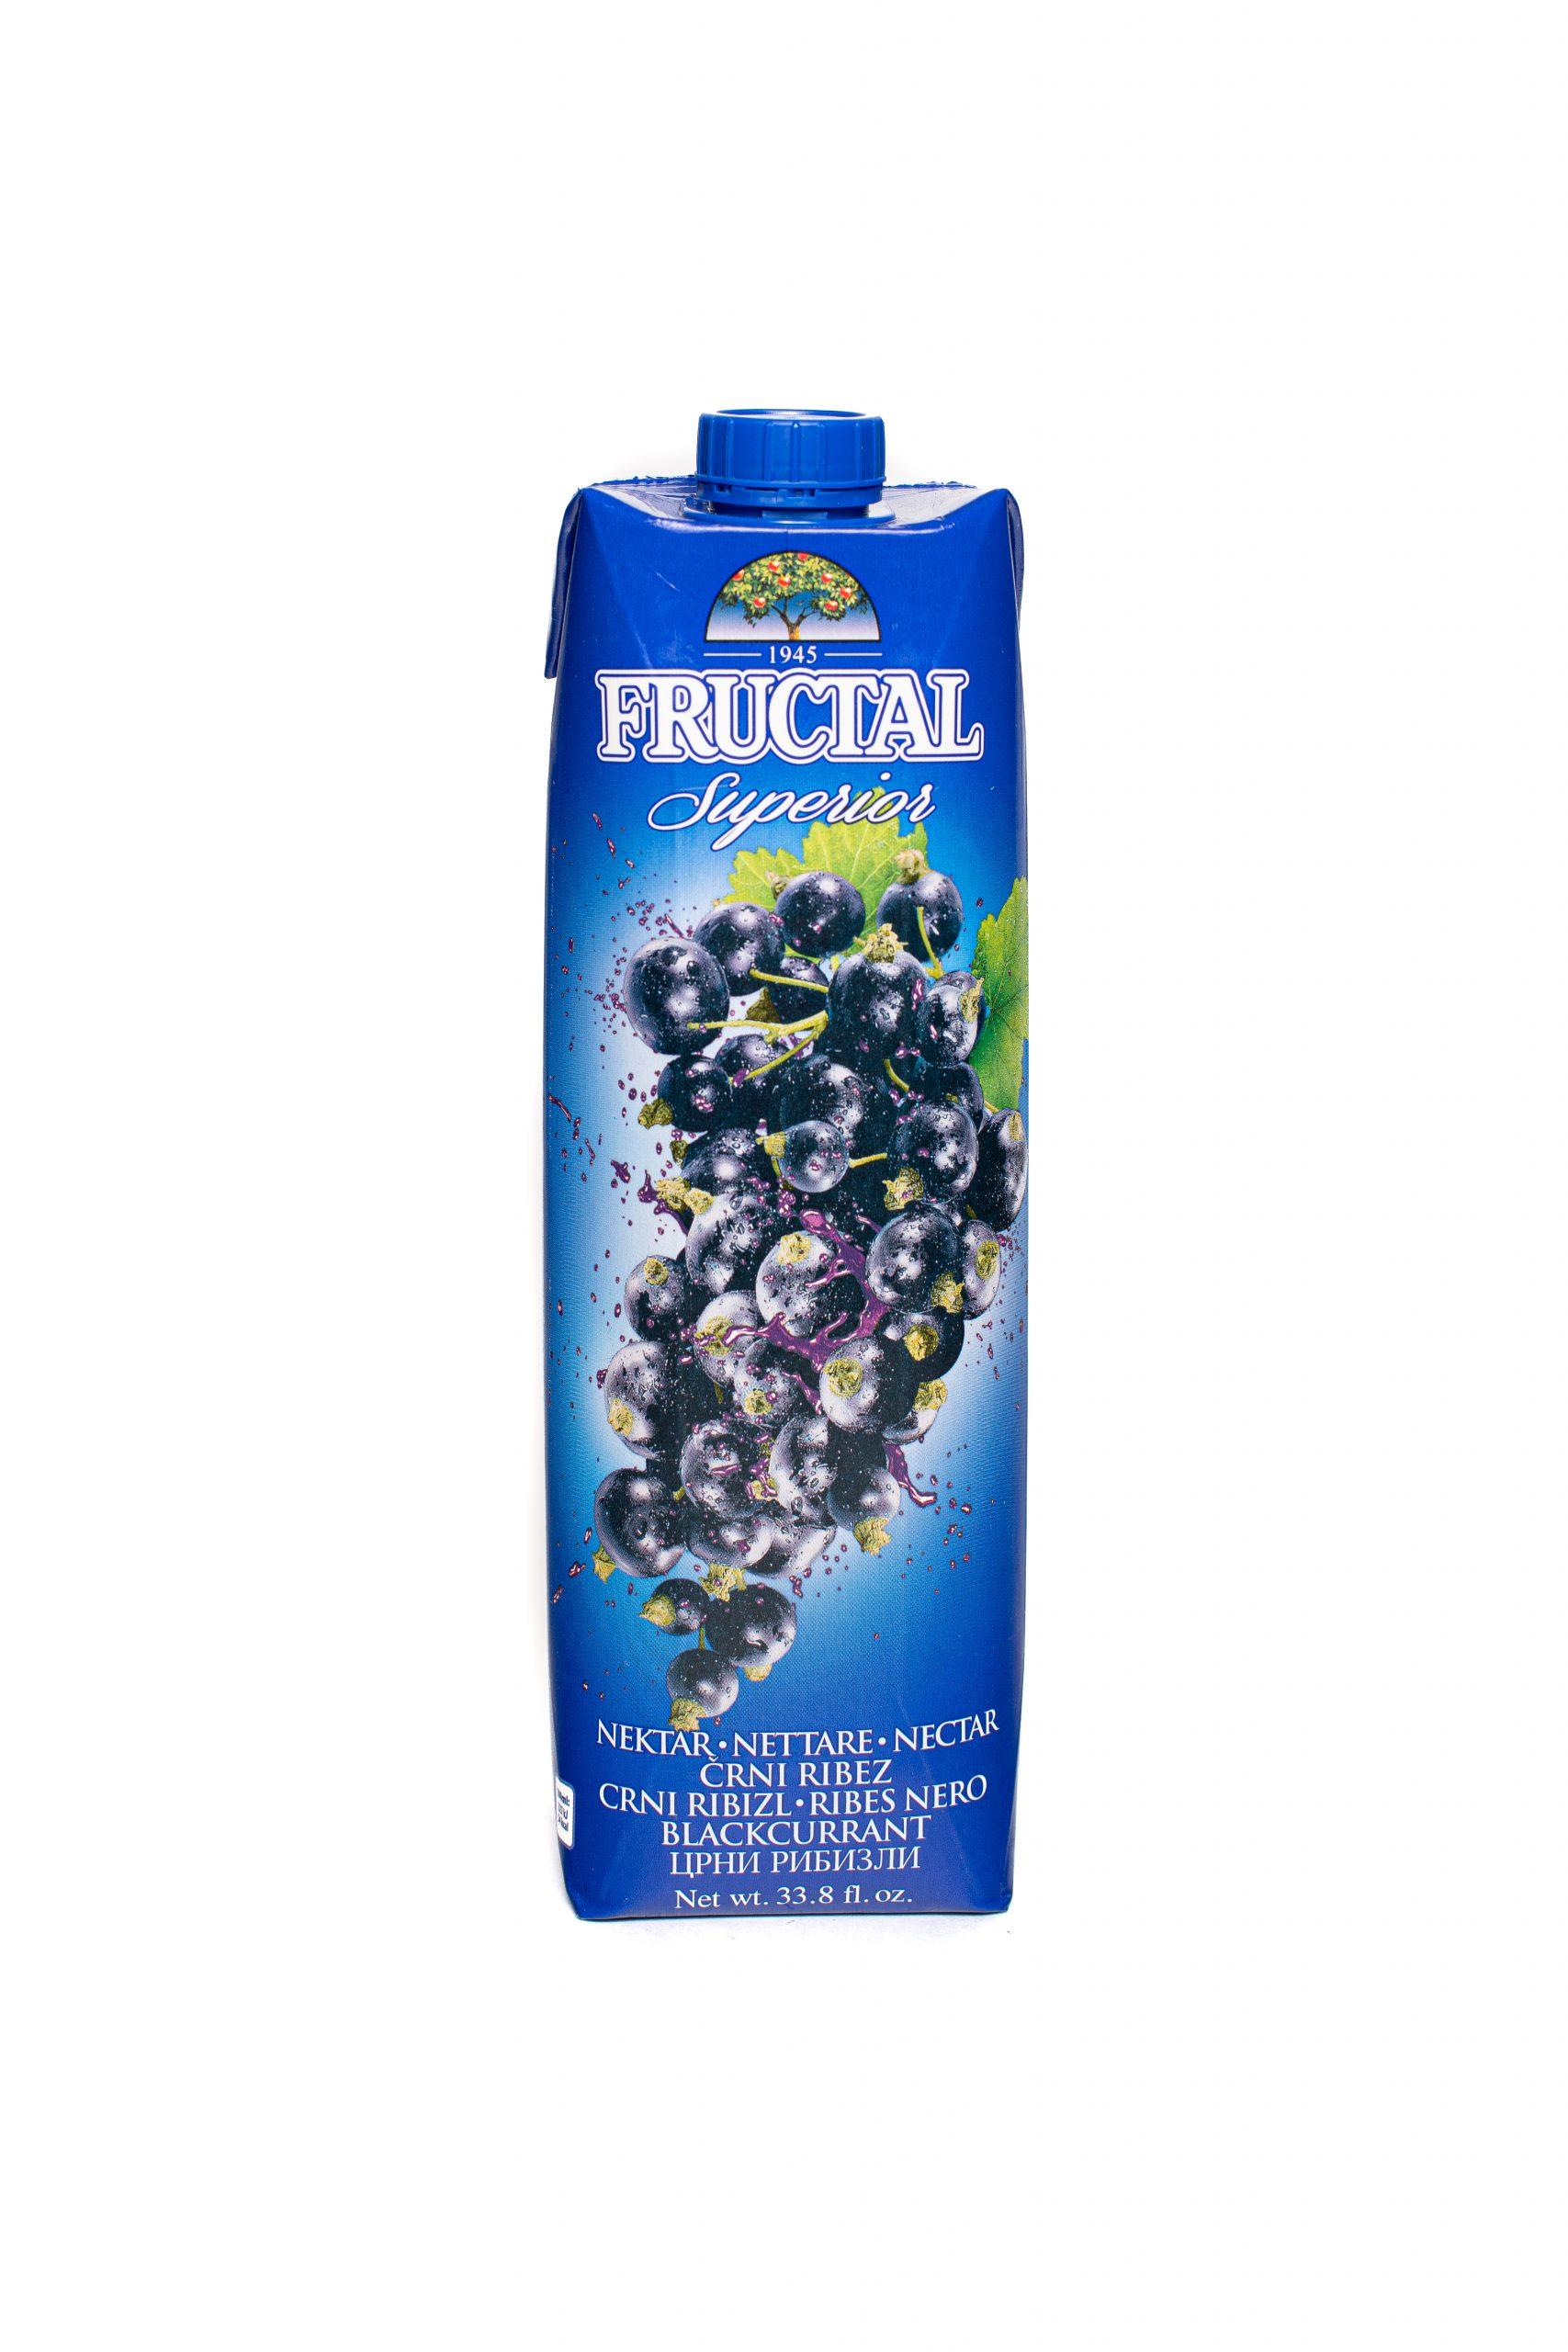 Fructal Superior | 1L | Black Current